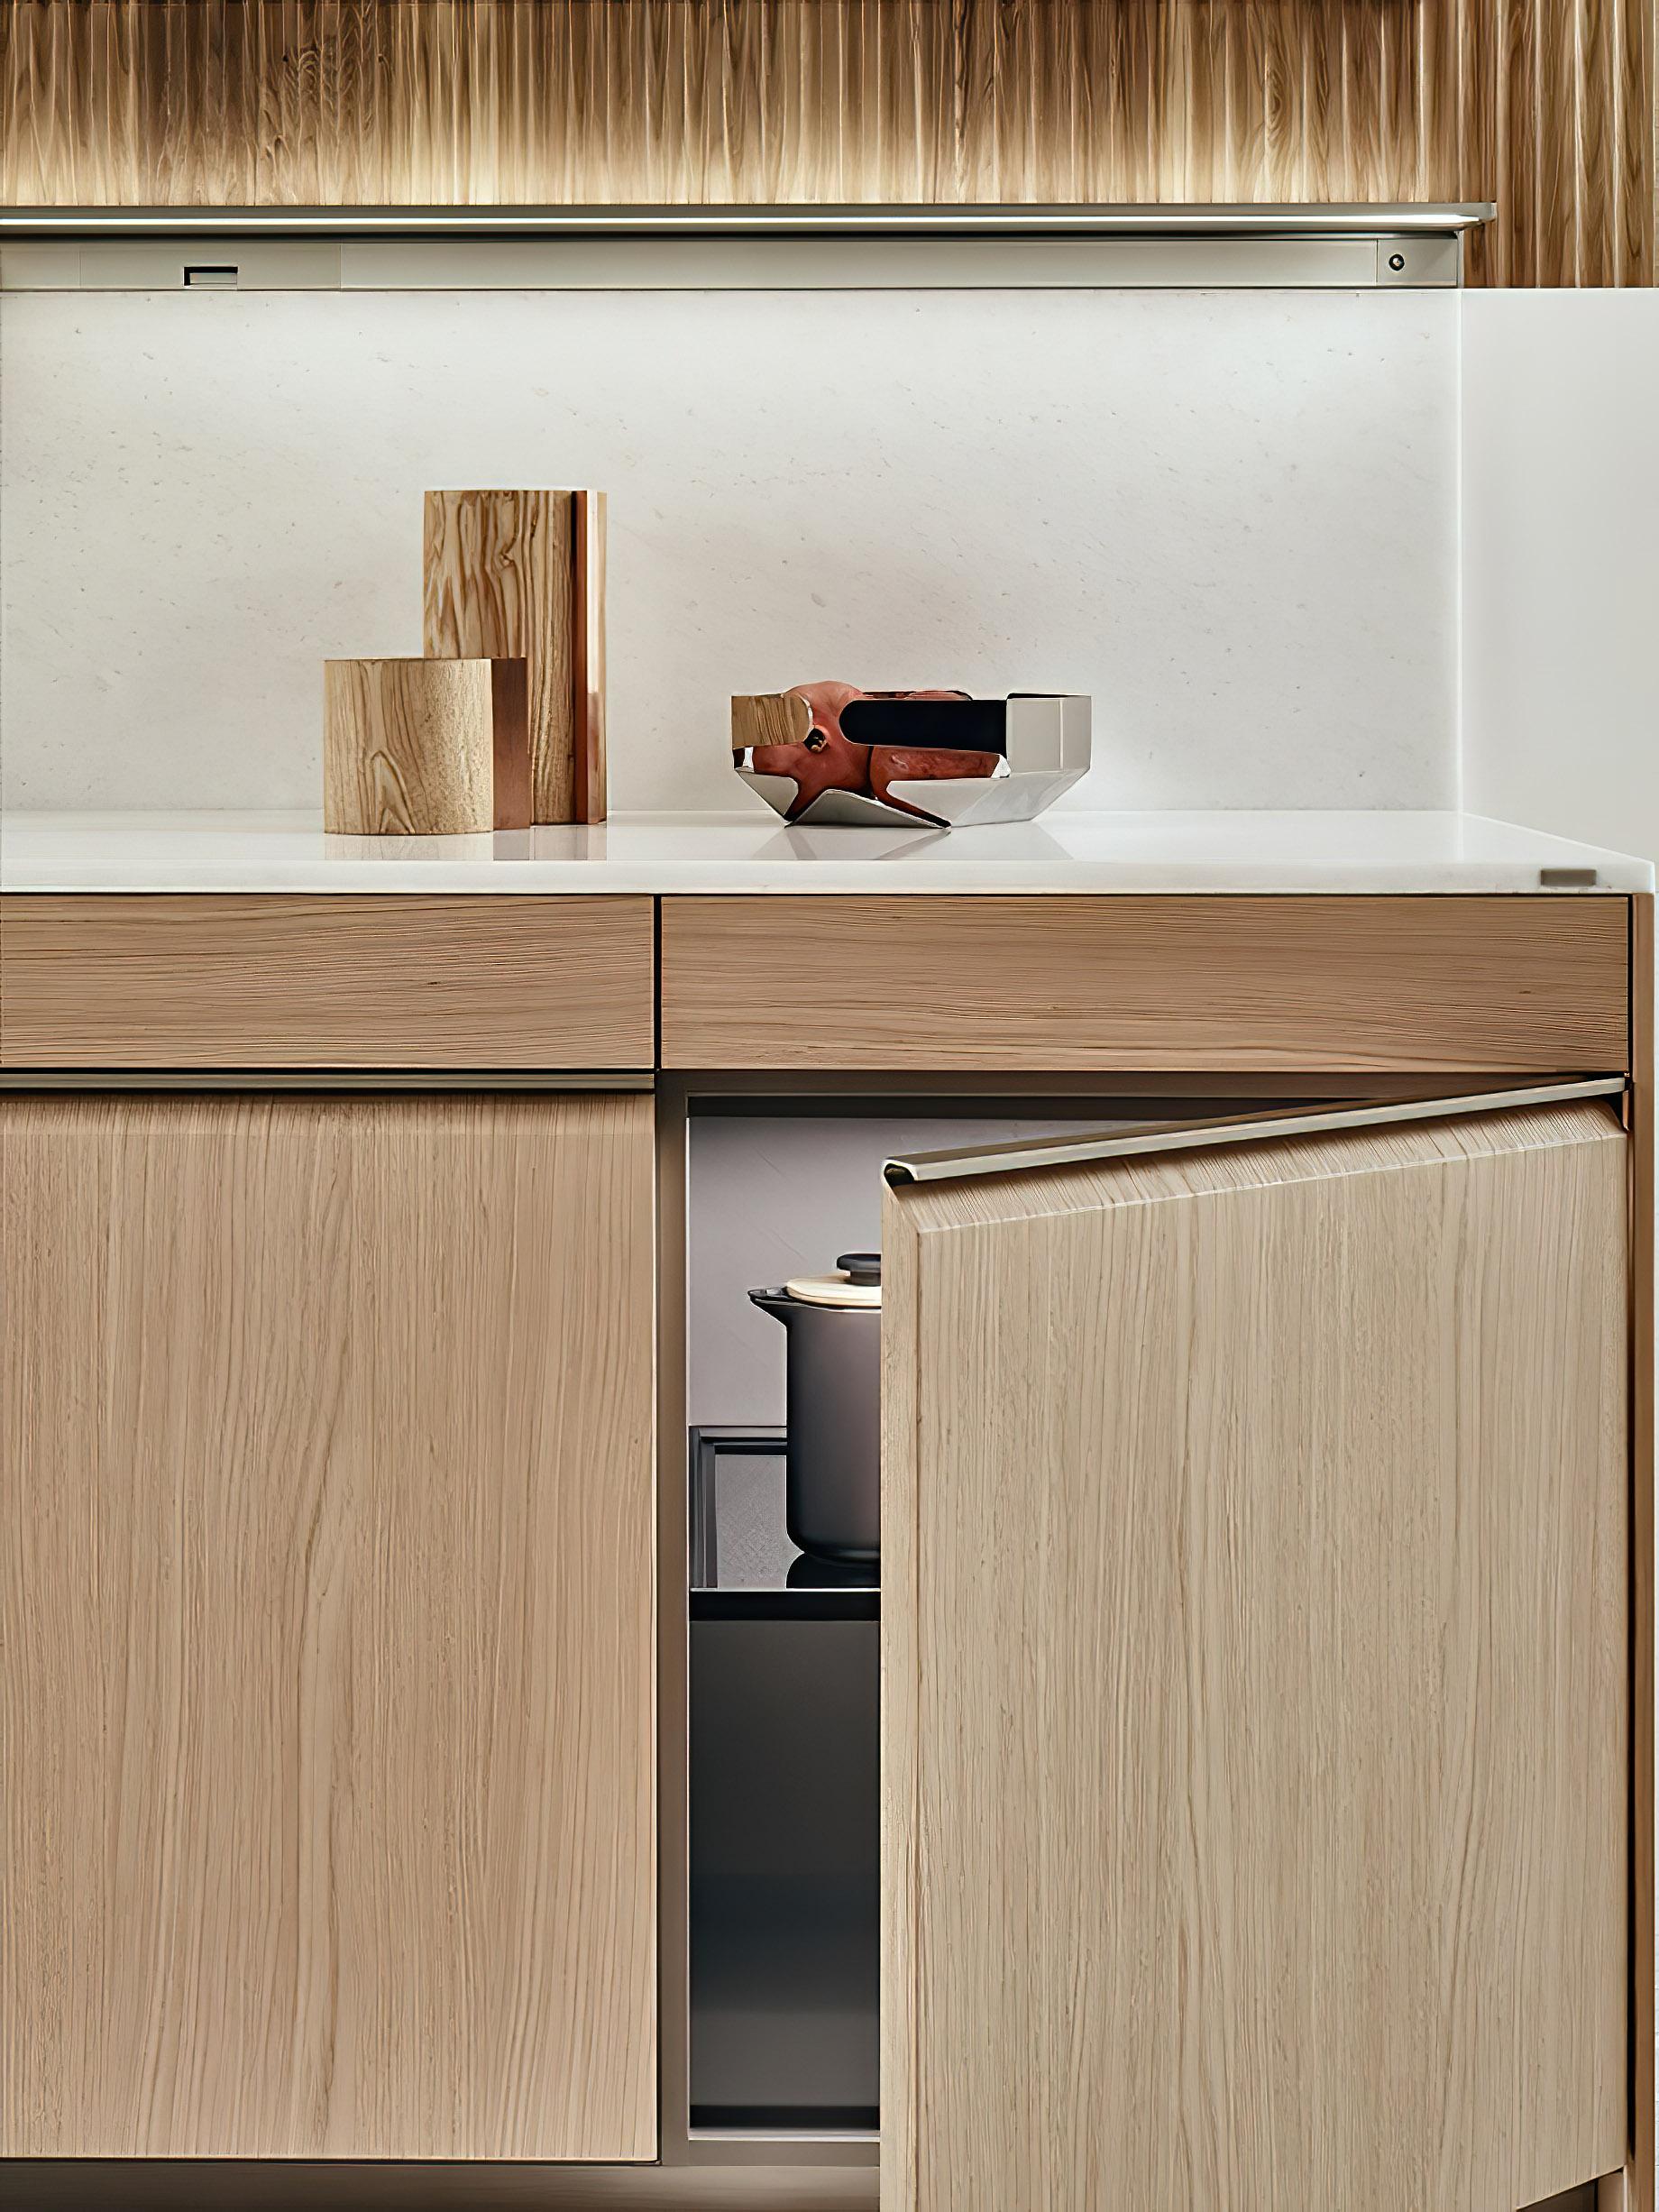 K-lab Contemporary Kitchen Ernestomeda Italy – Giuseppe Bavuso